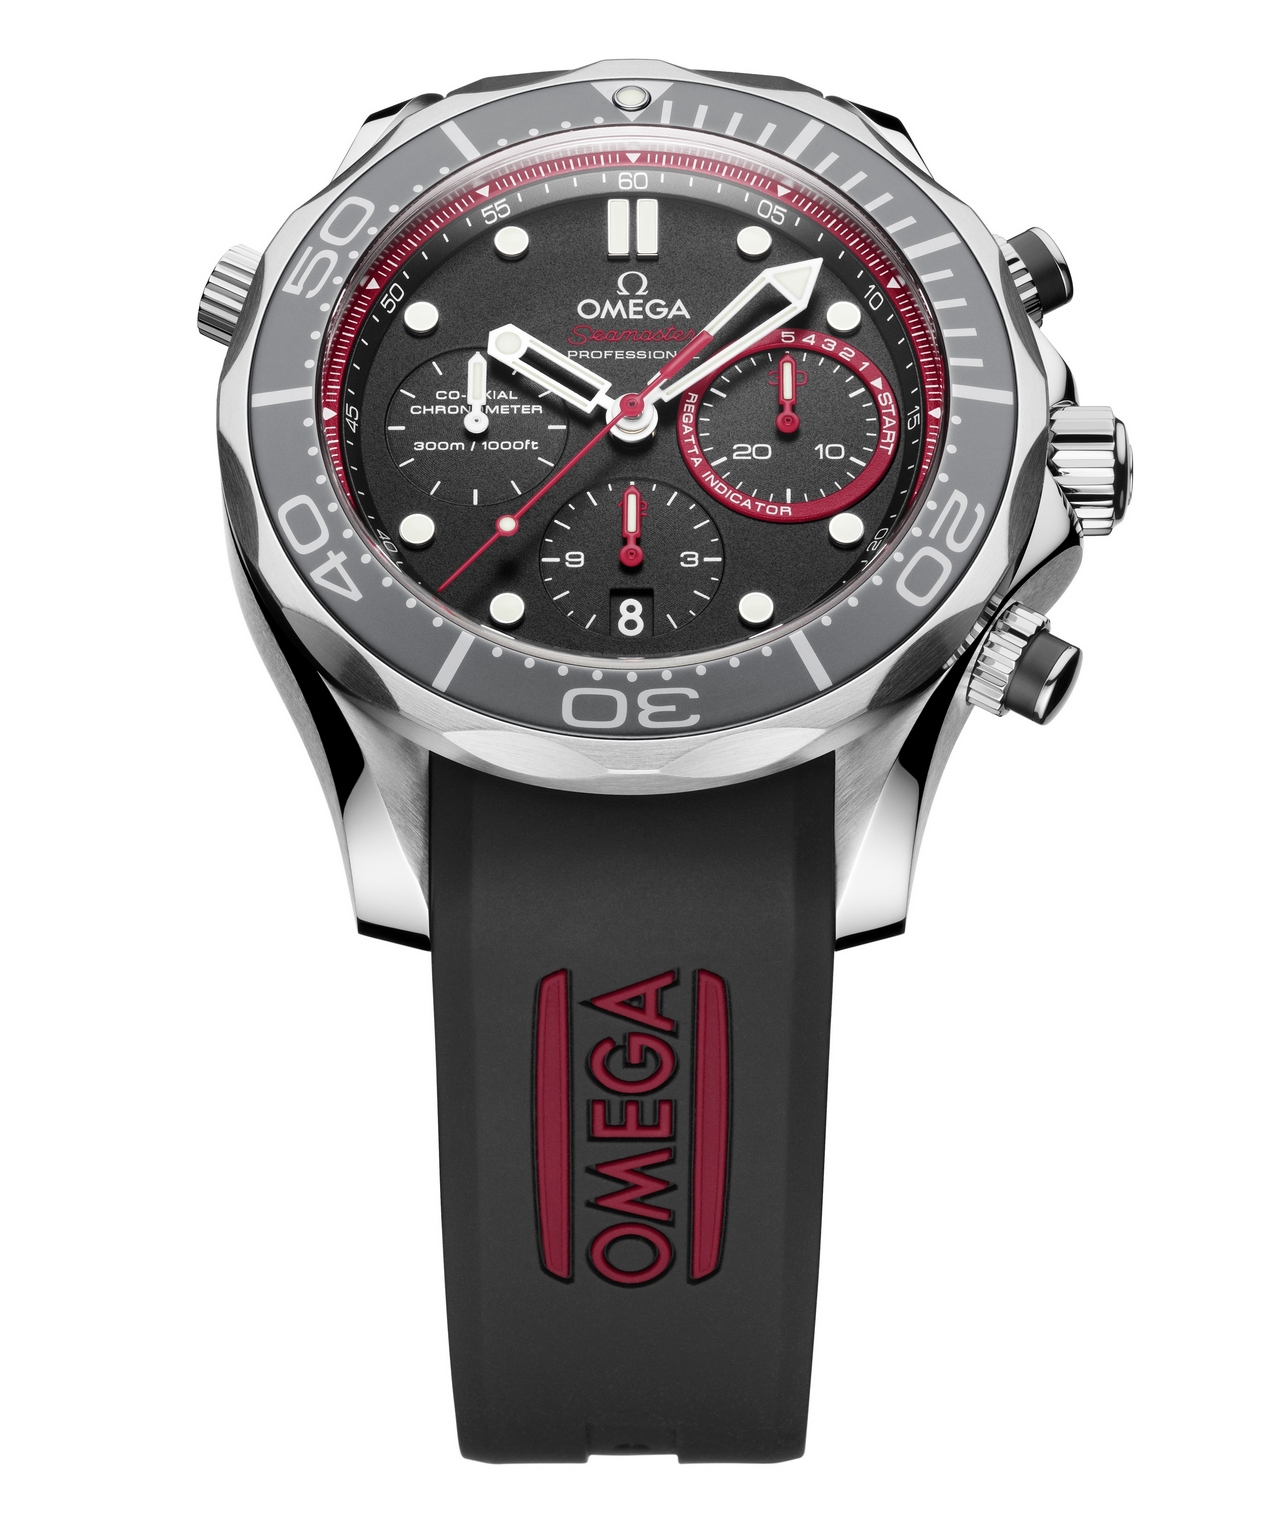 omega-seamaster-diver-etnz-limited-edition_0-100_13